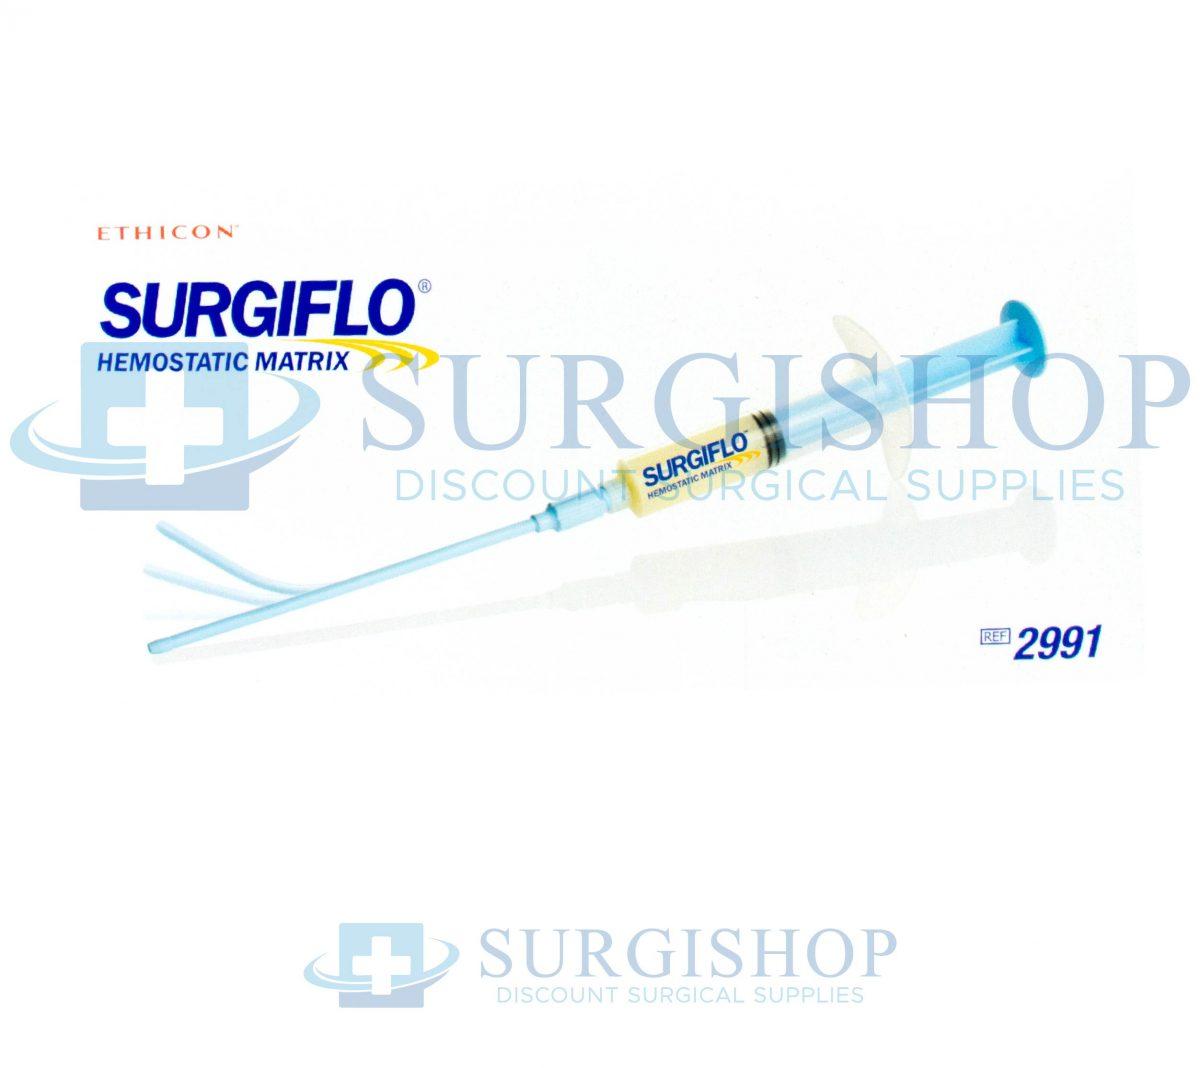 Ethicon Surgiflo Hemostatic Matrix 8.0 ML